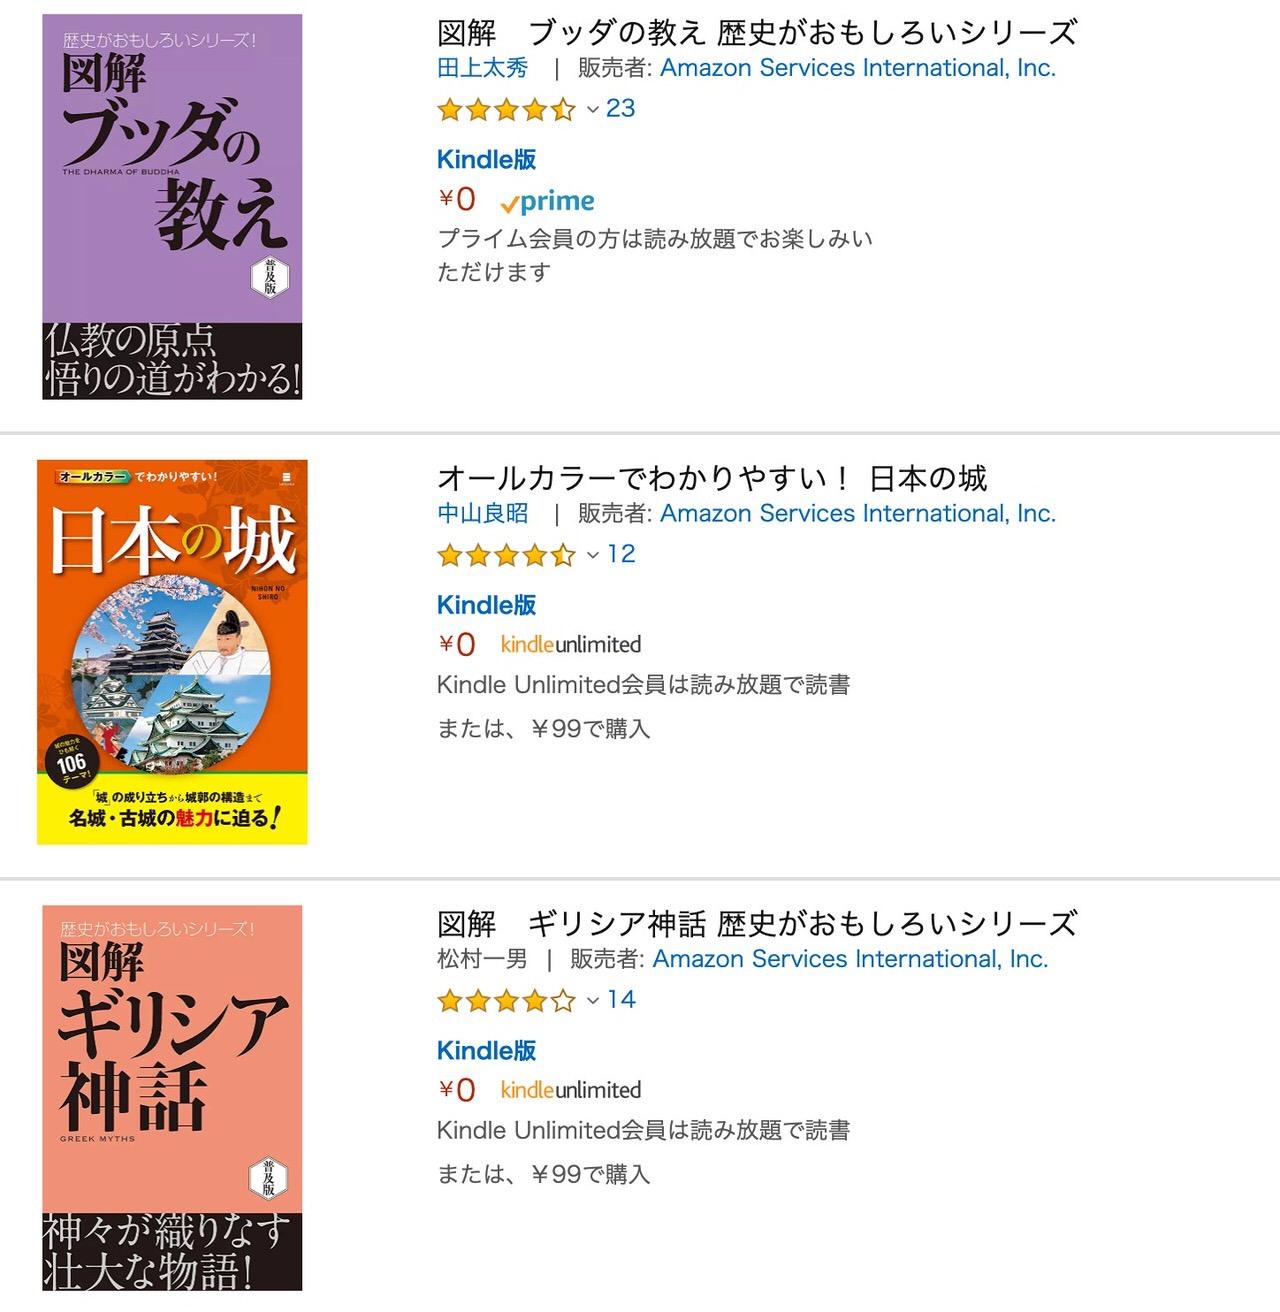 【Kindleセール】日本史、幕末、戦国史、三国志など「歴史解説本99円フェア」(6/30まで)